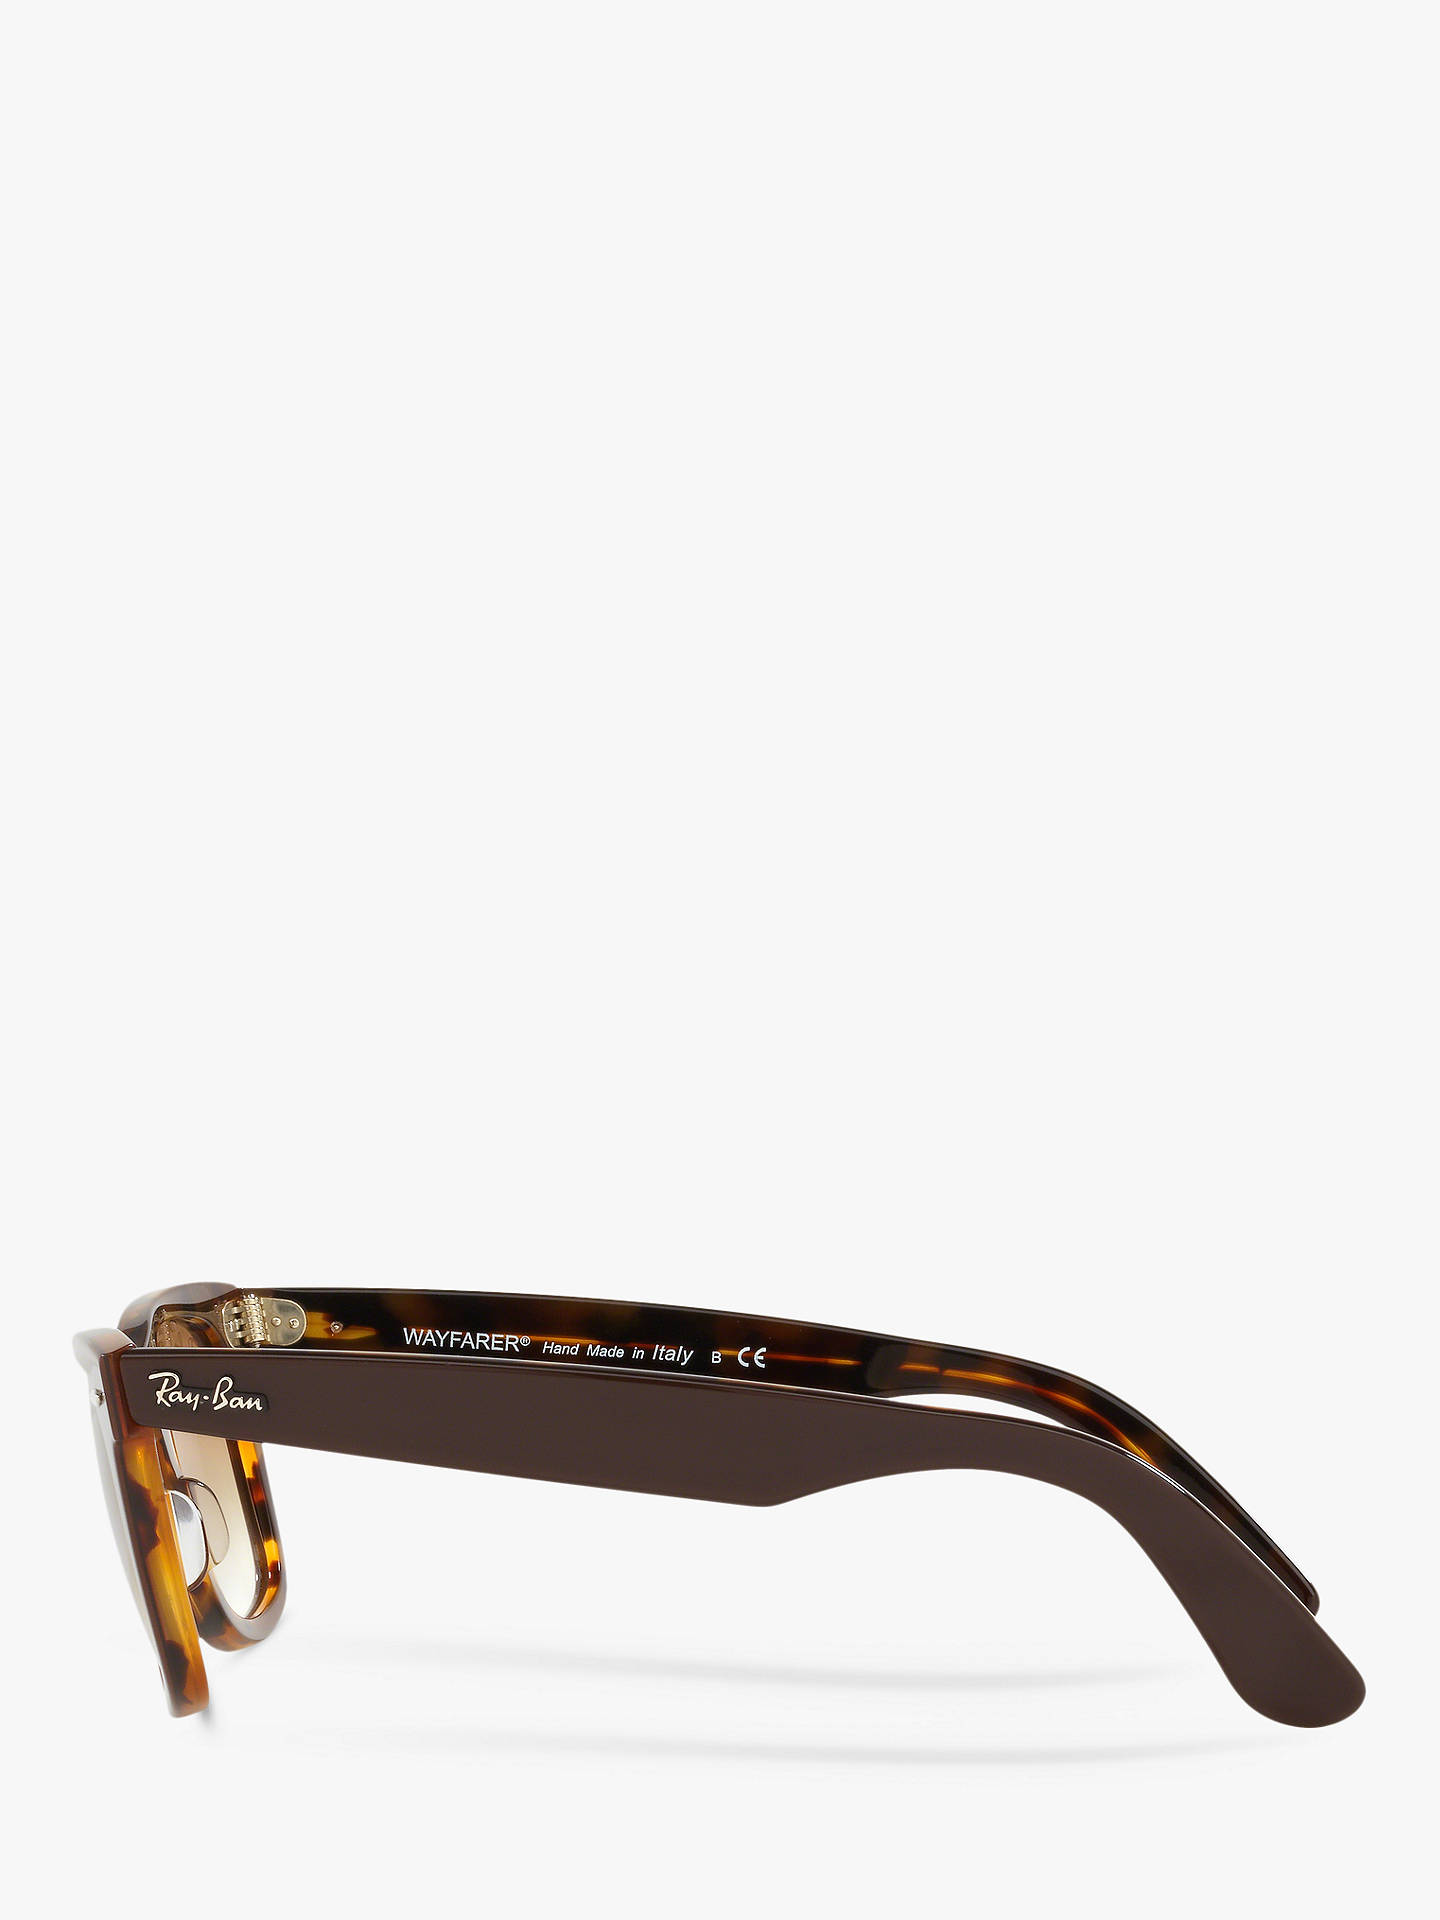 35b0853e39 ... BuyRay-Ban RB2140 Women s Original Wayfarer Sunglasses